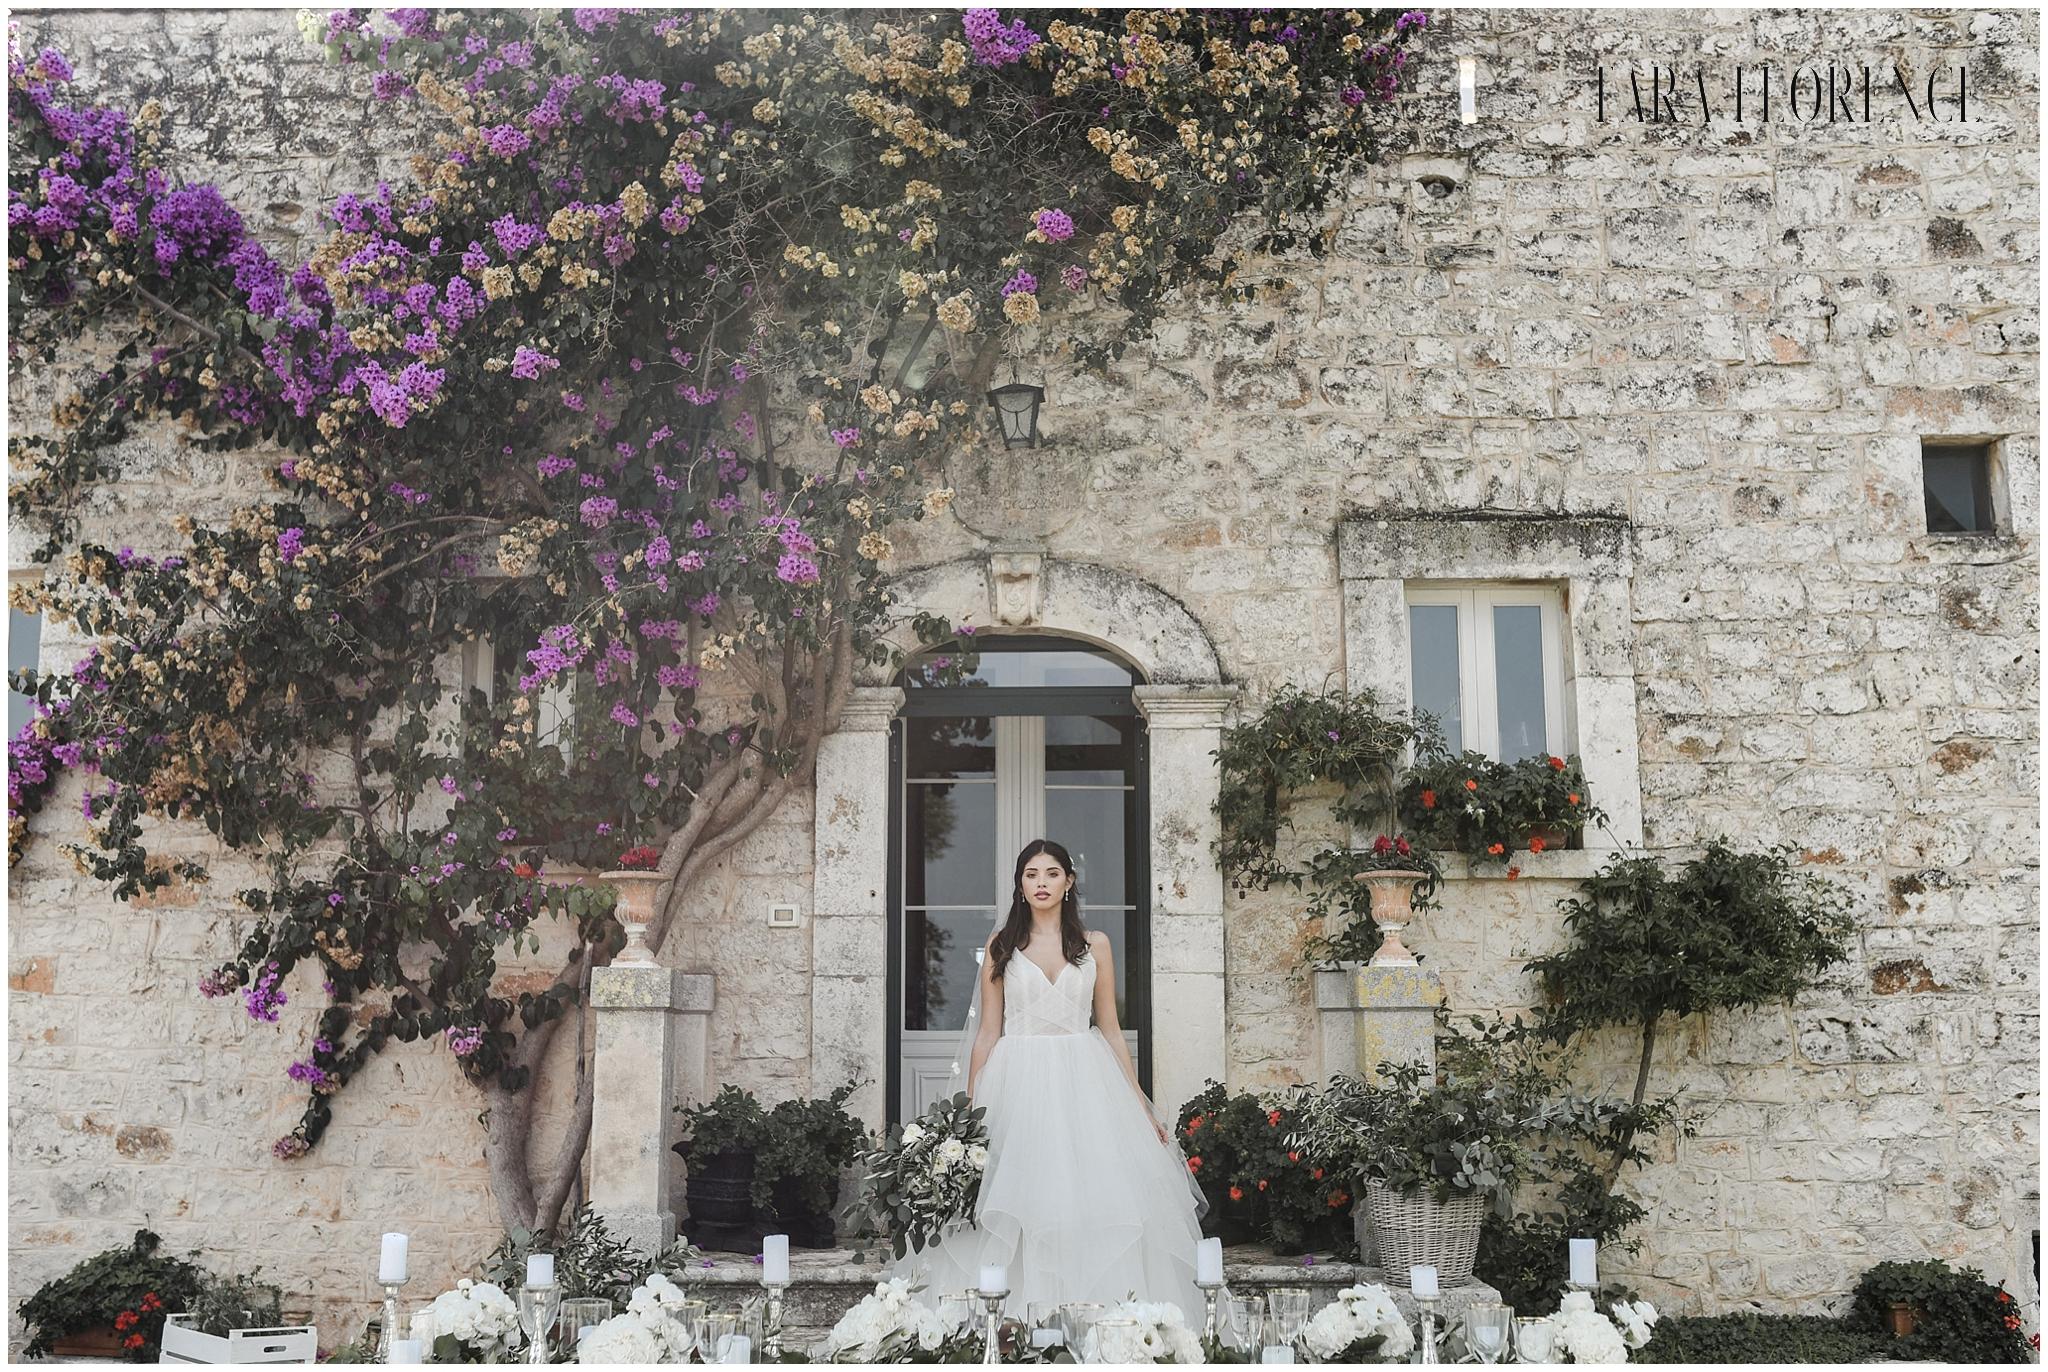 Puglia-Tara-Florence-Bridal-Editorial-135_WEB.jpg